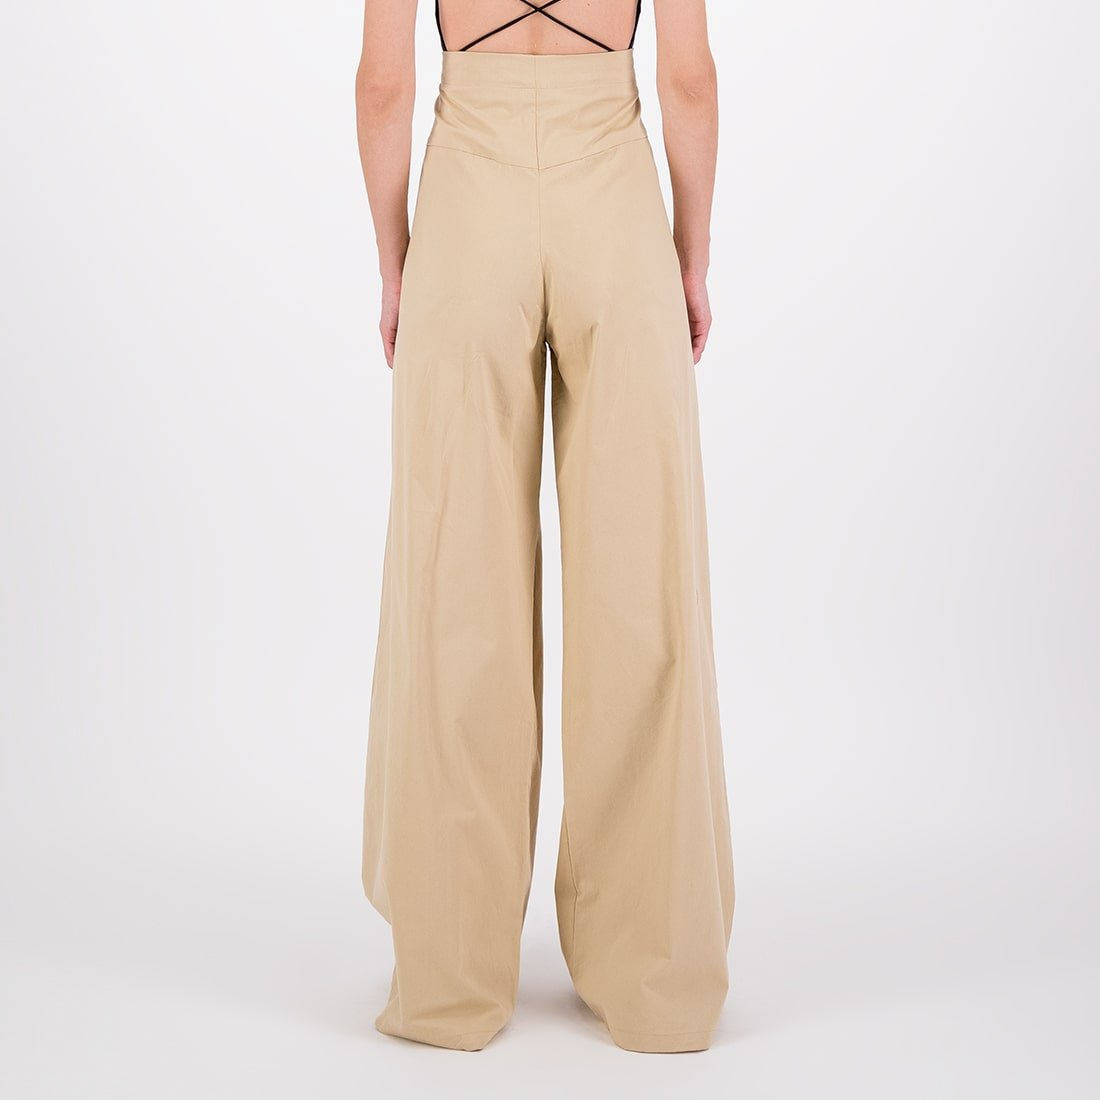 Wide-leg, high-waist dyed pant 3